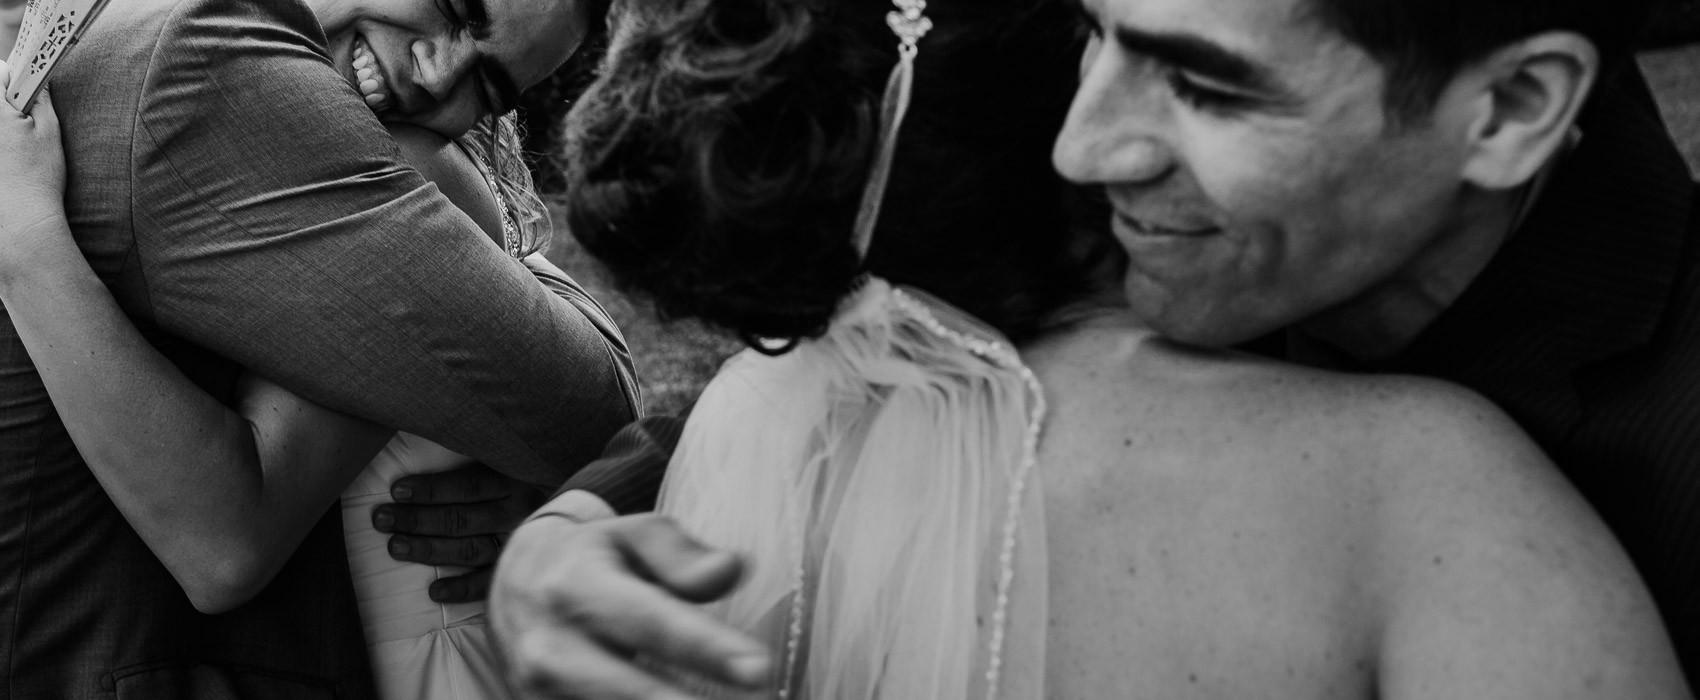 renato dpaula foto dos noivos emocionados na cerimonia